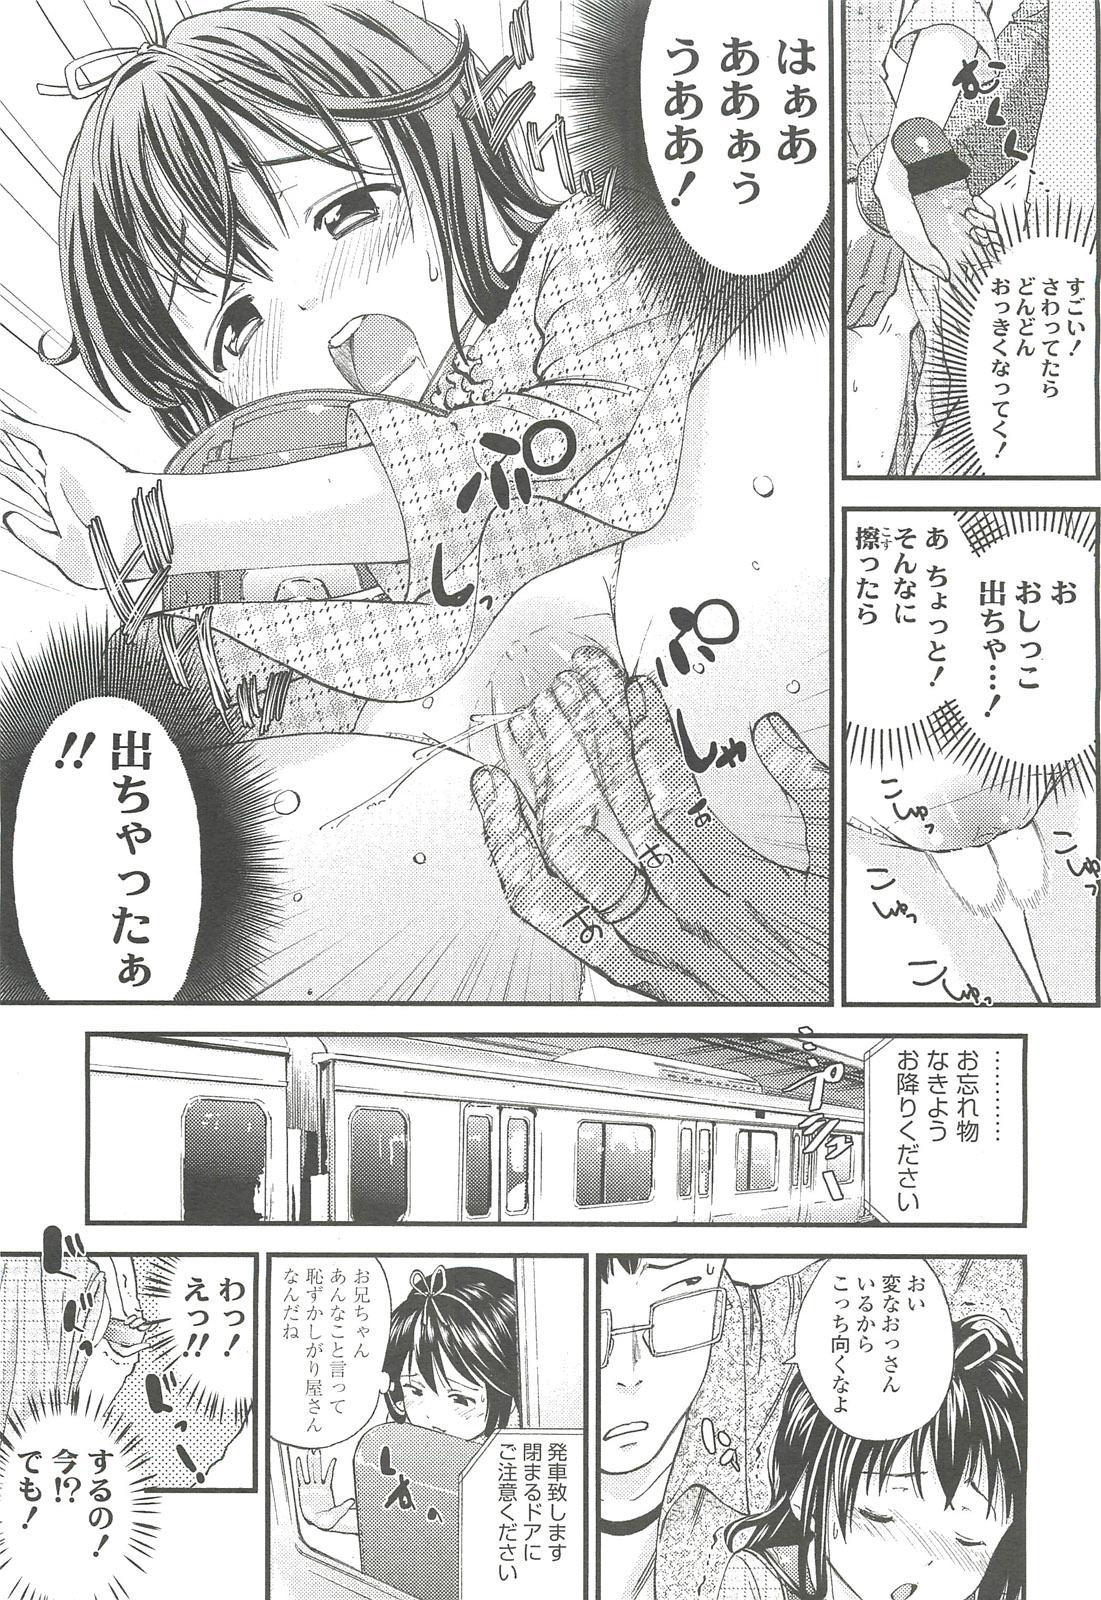 COMIC LO 2010-10 Vol. 79 99